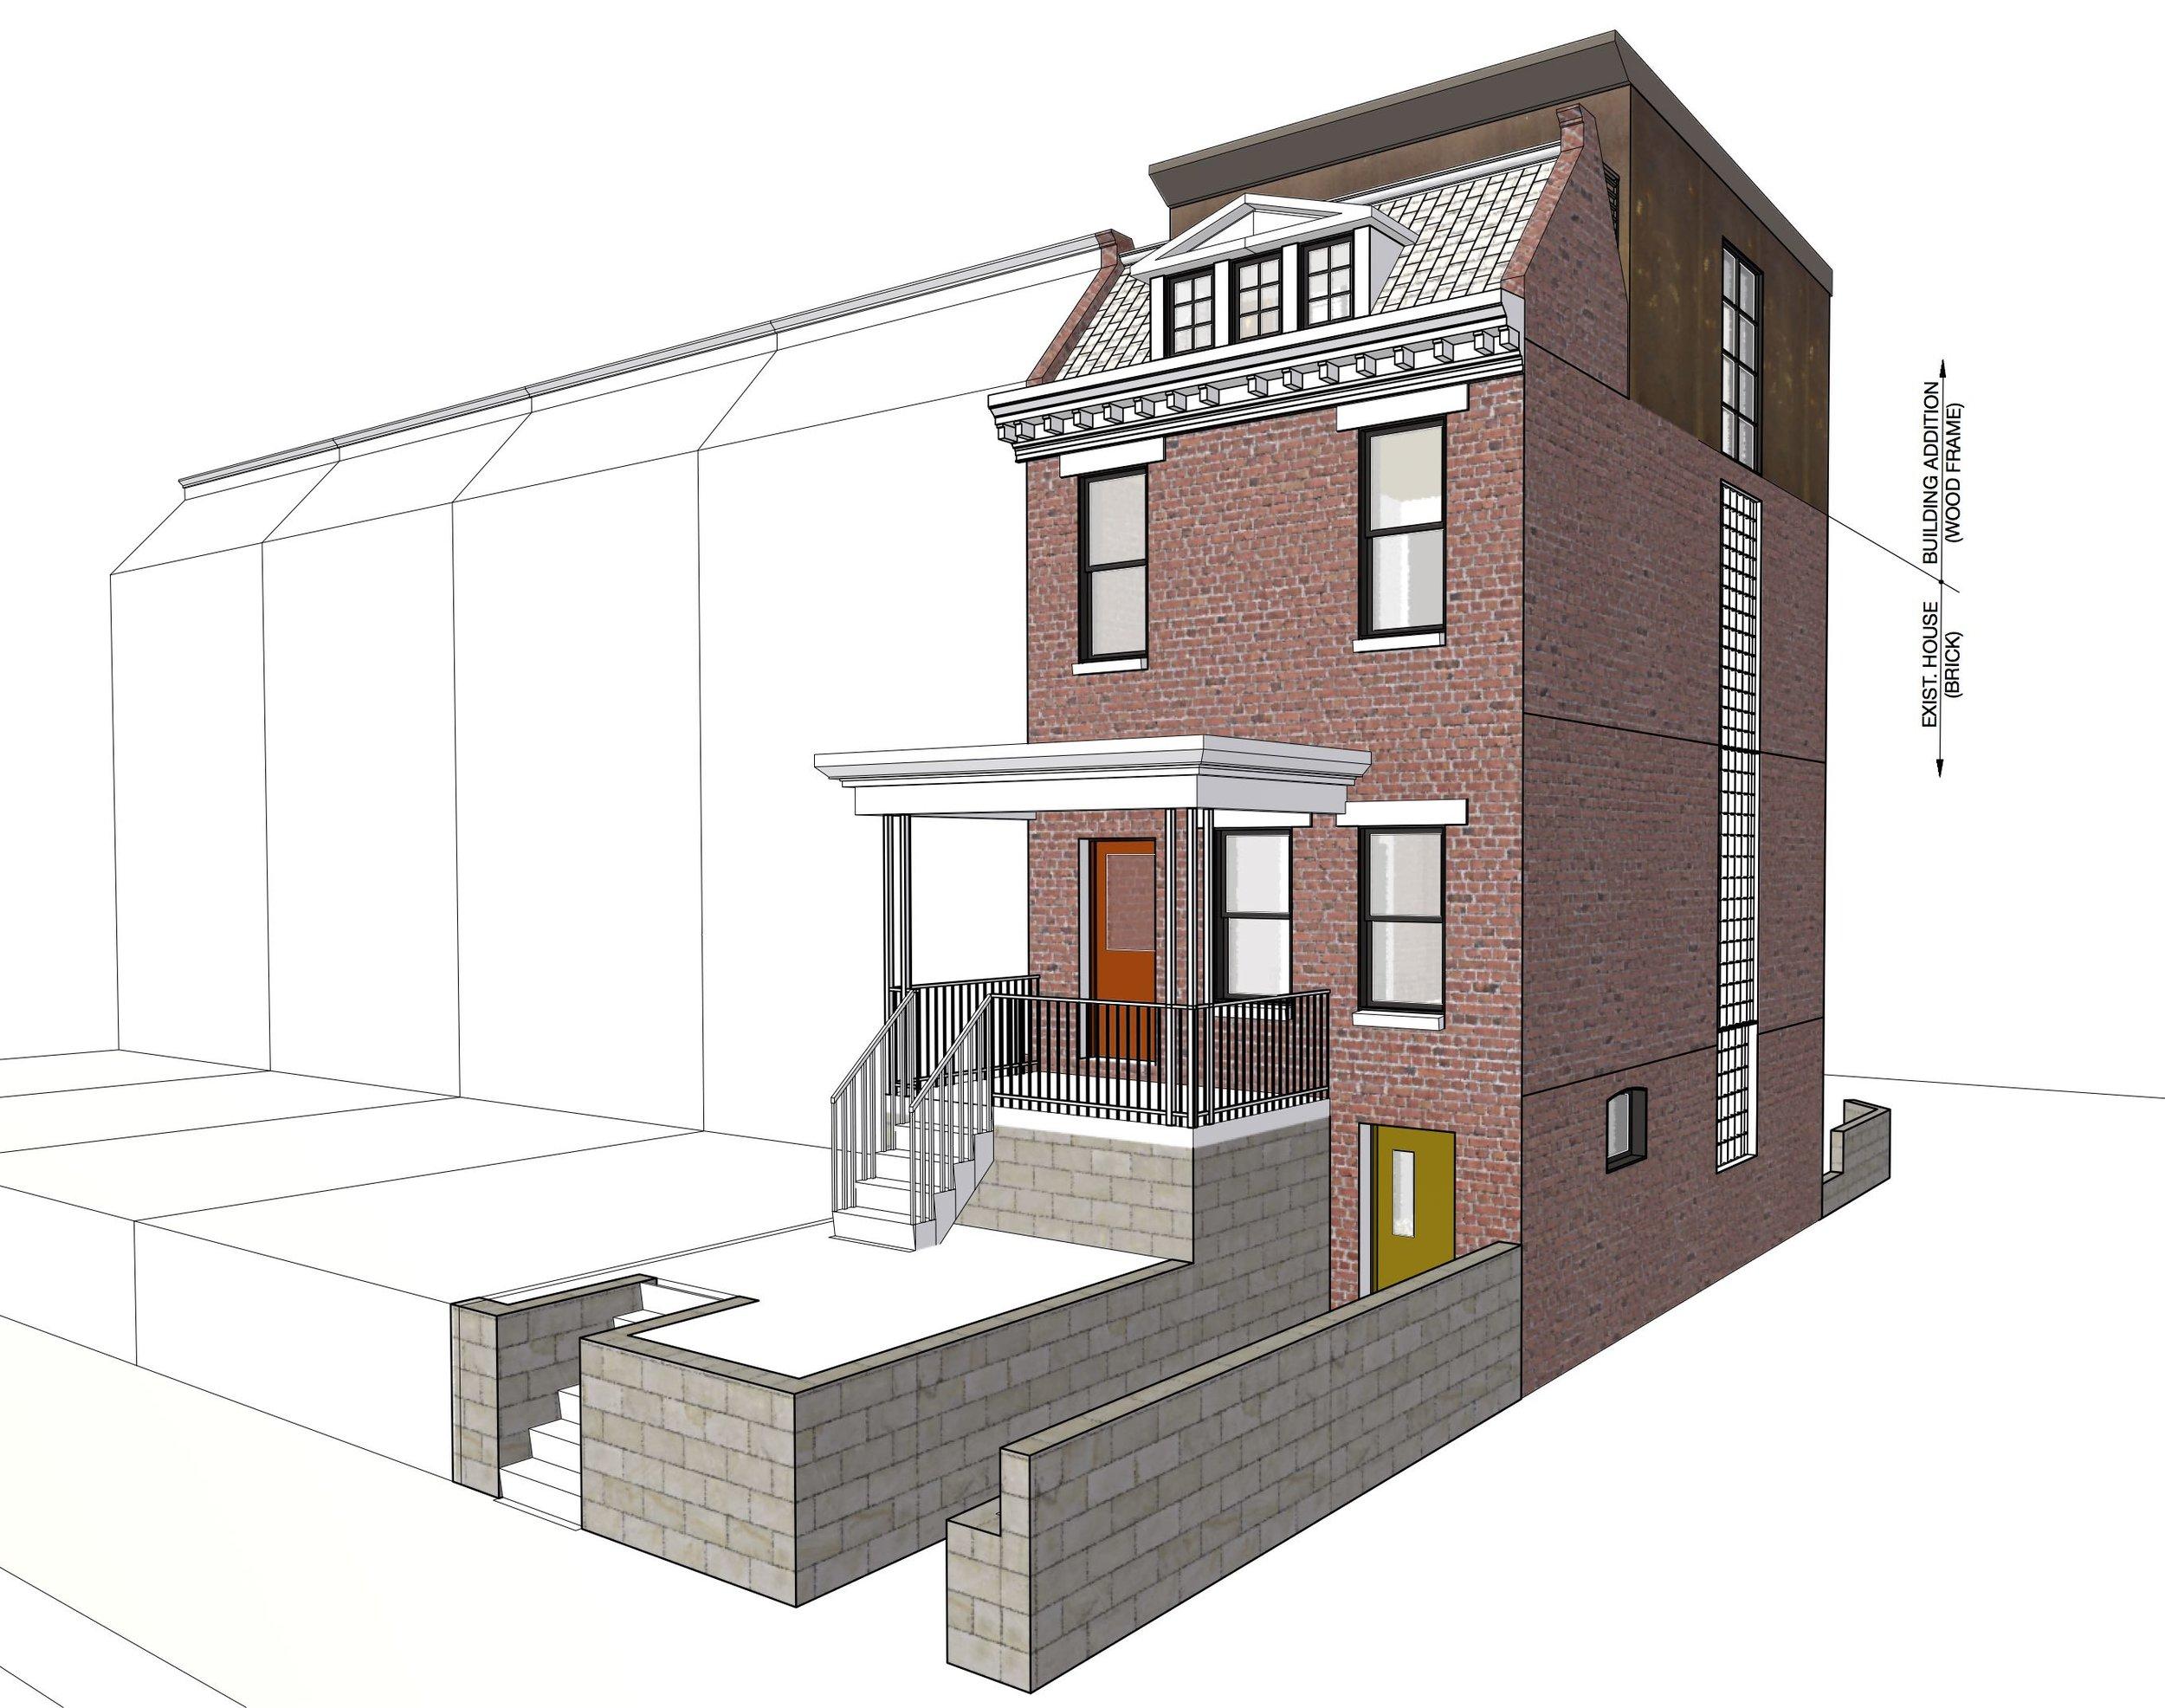 The proposed design, retains the original front facade.